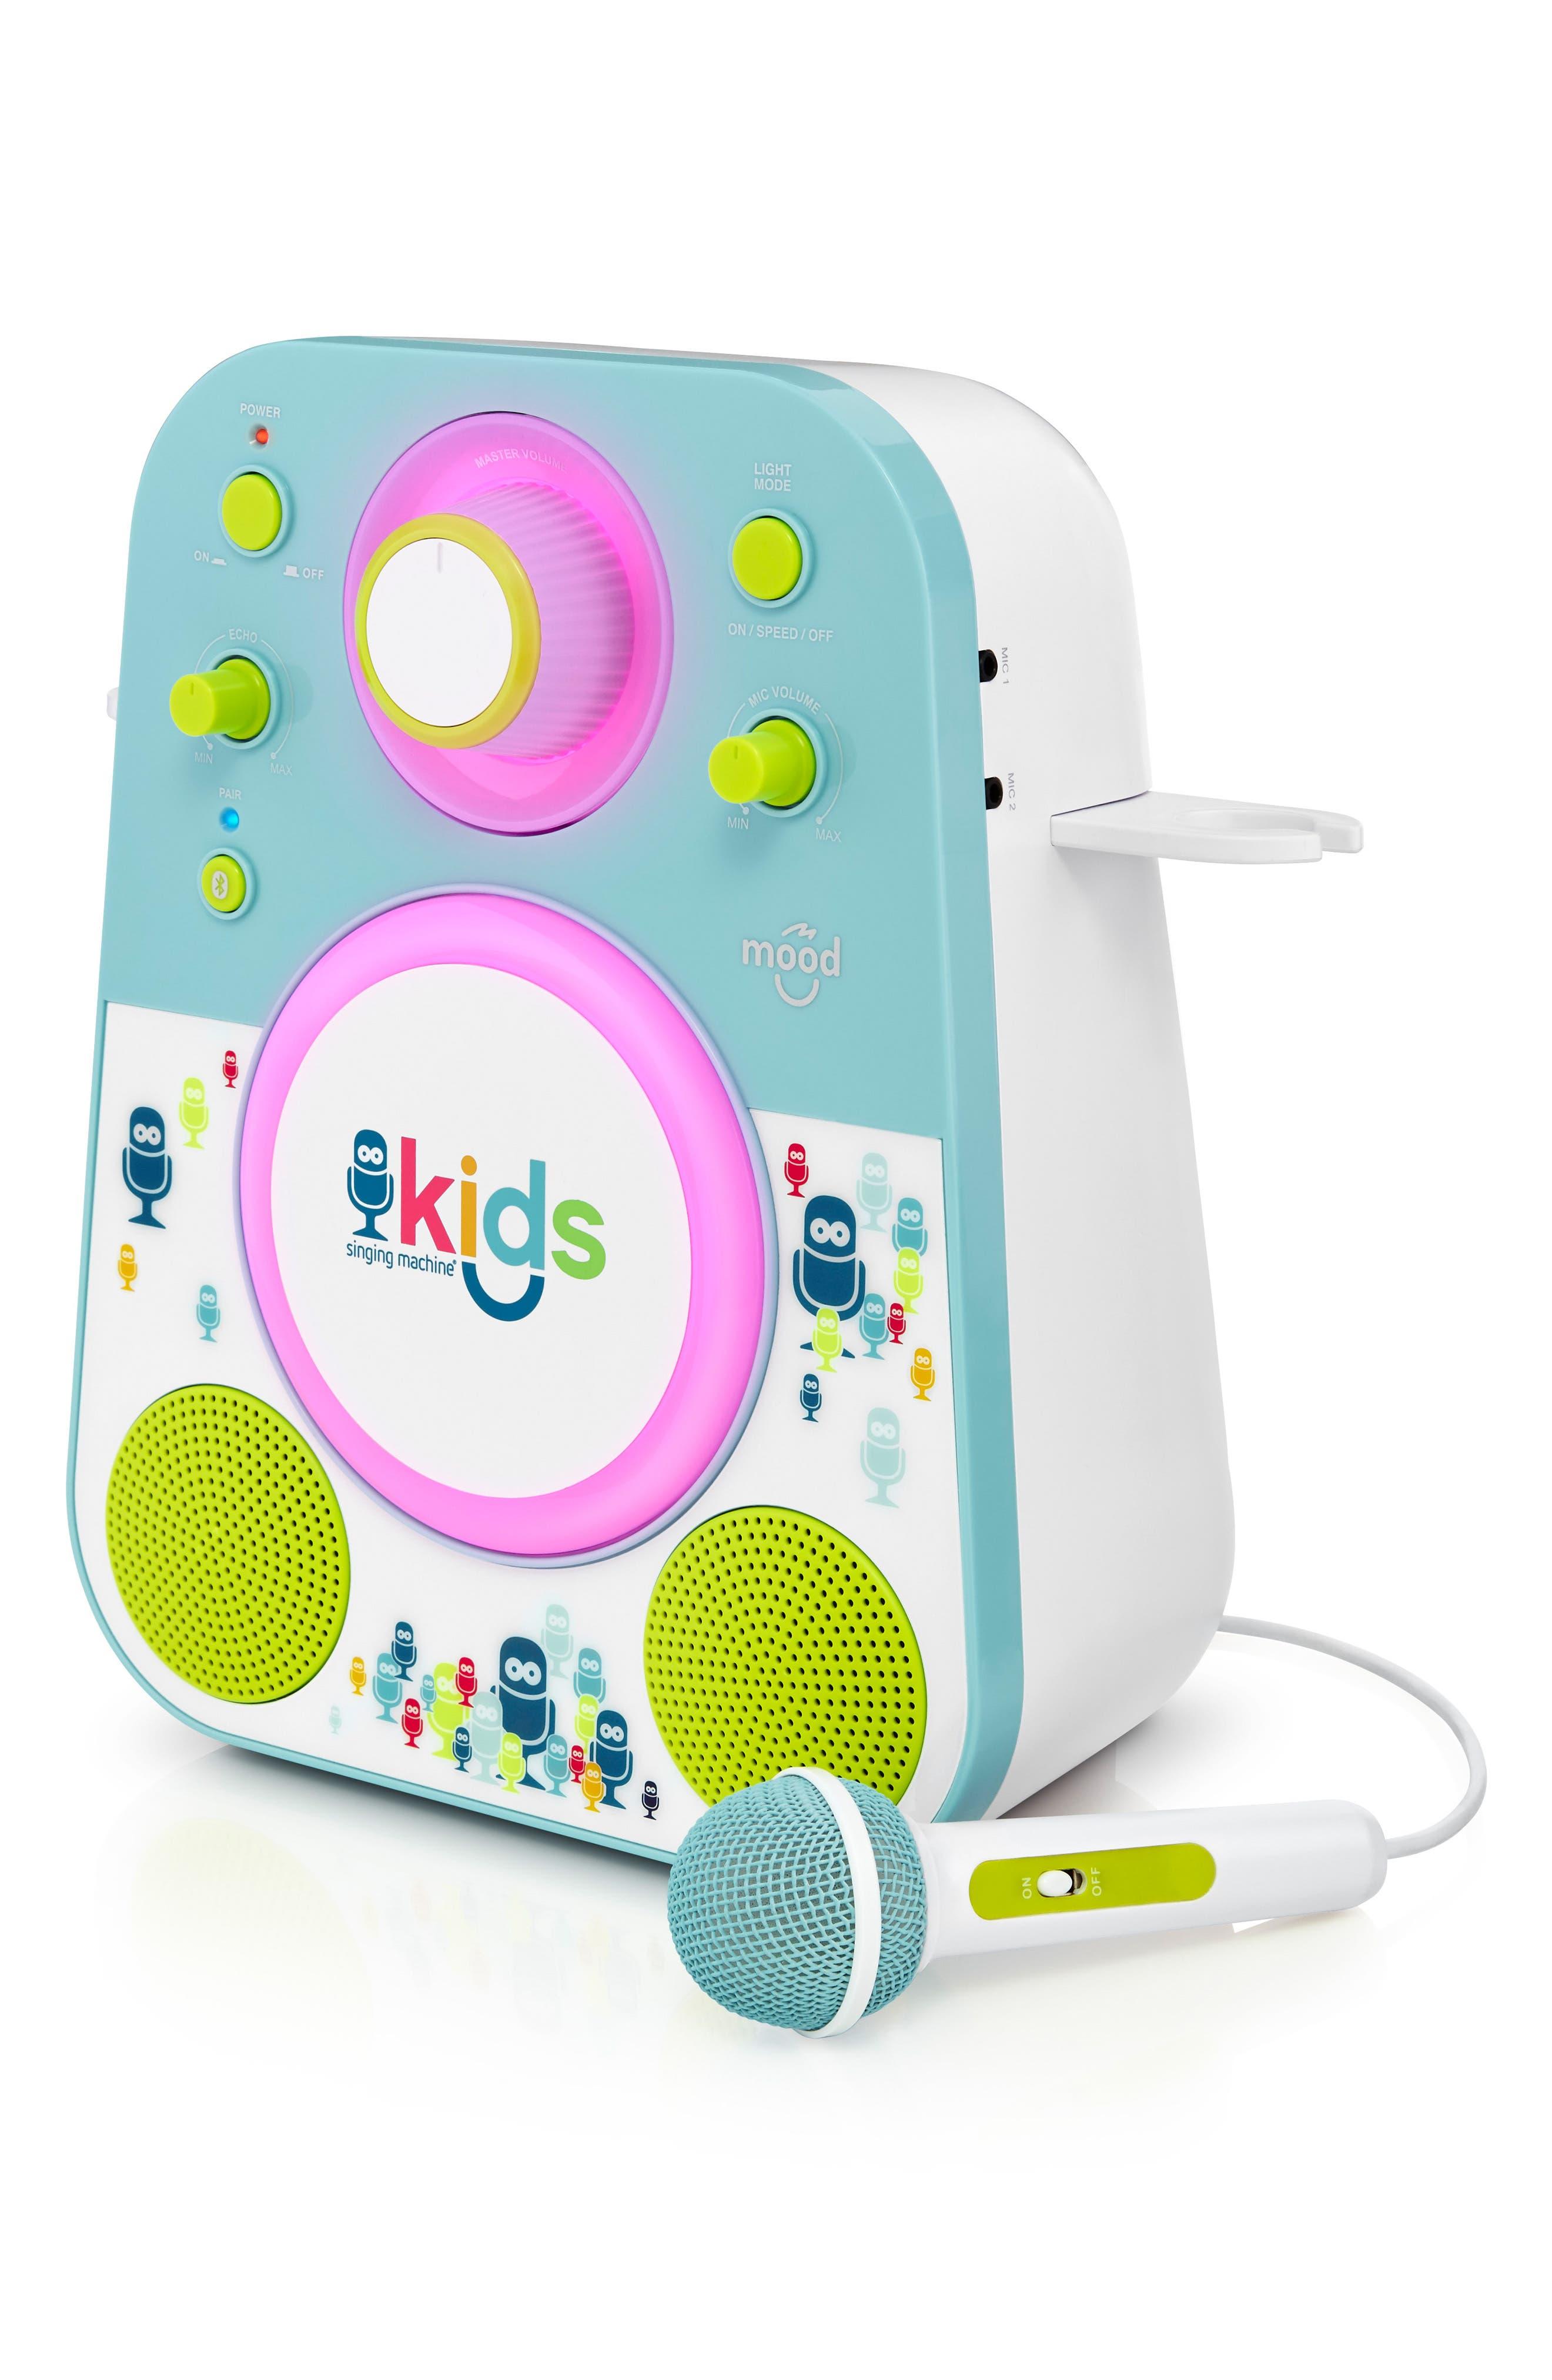 Kids Mood Karaoke System,                             Alternate thumbnail 3, color,                             BLUE GREEN